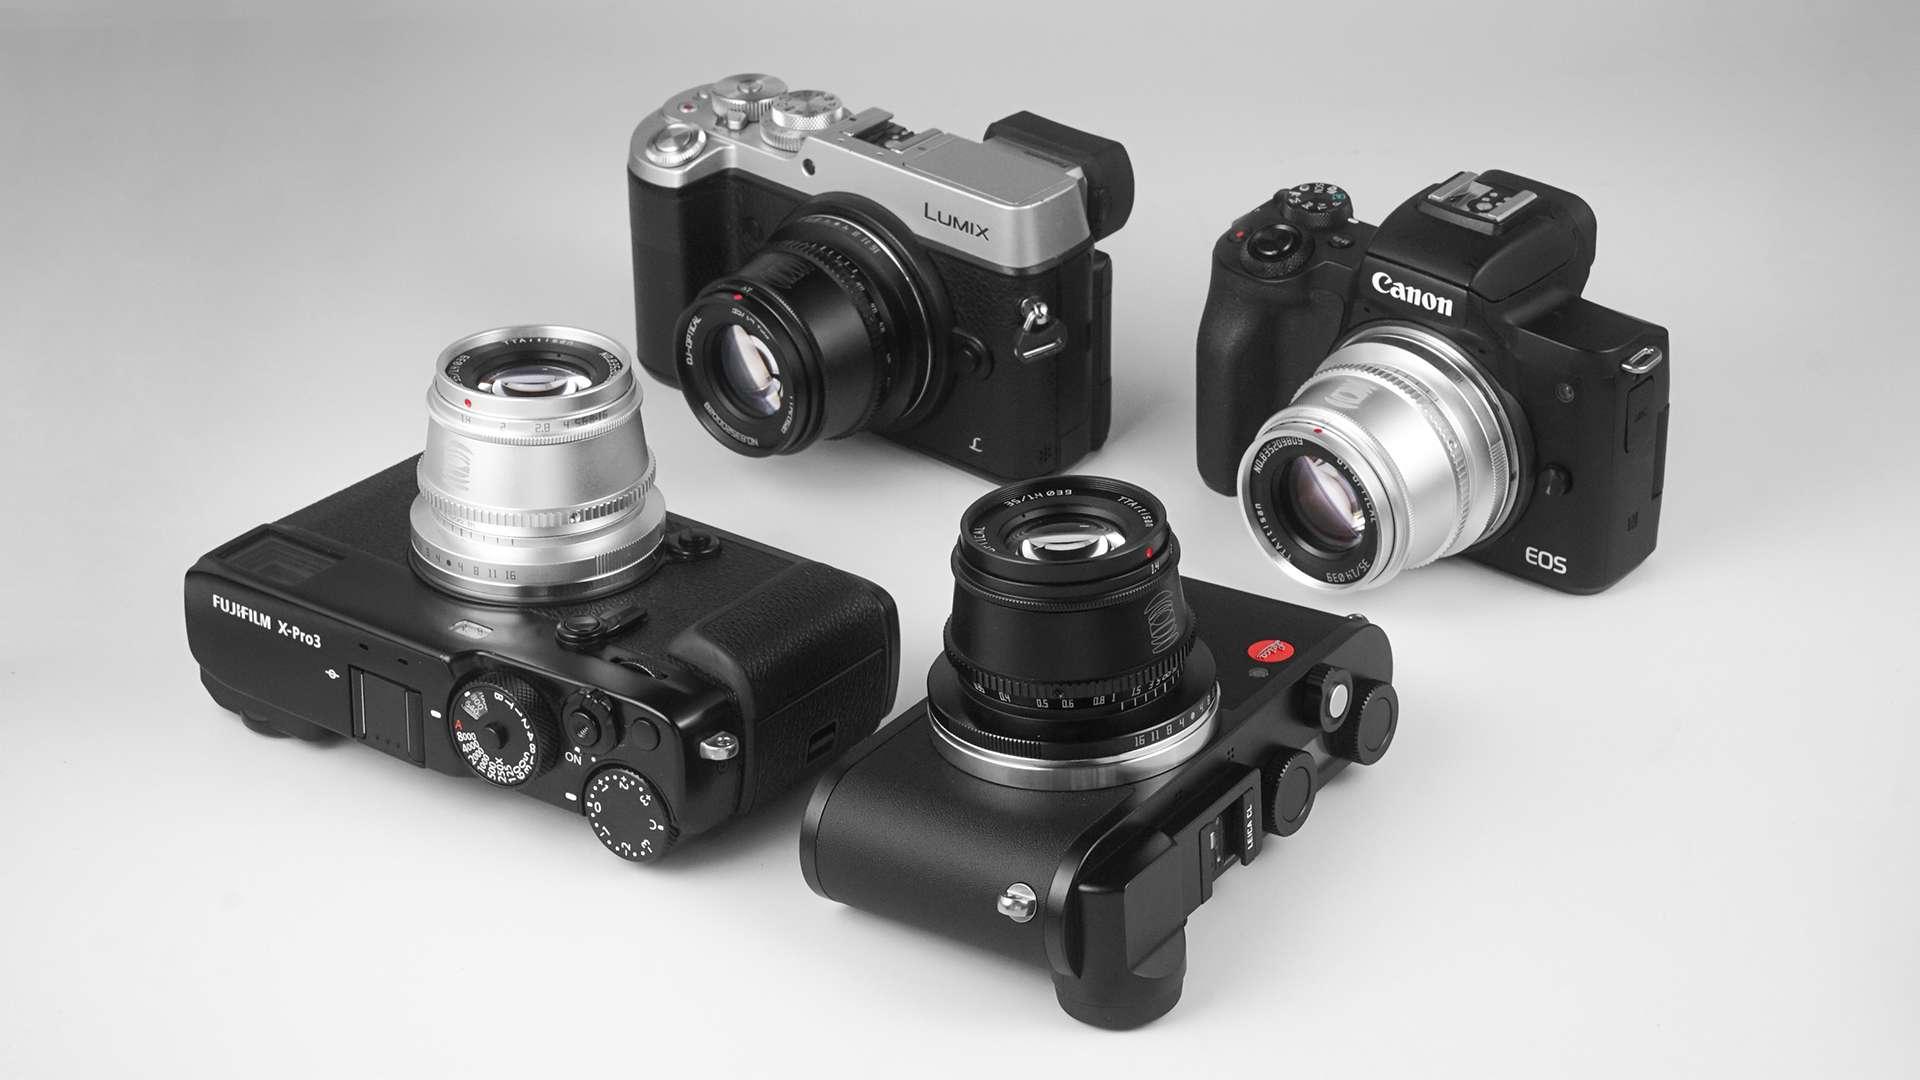 TTArtisan APS-C 35mm F1.4 lens on various camera models